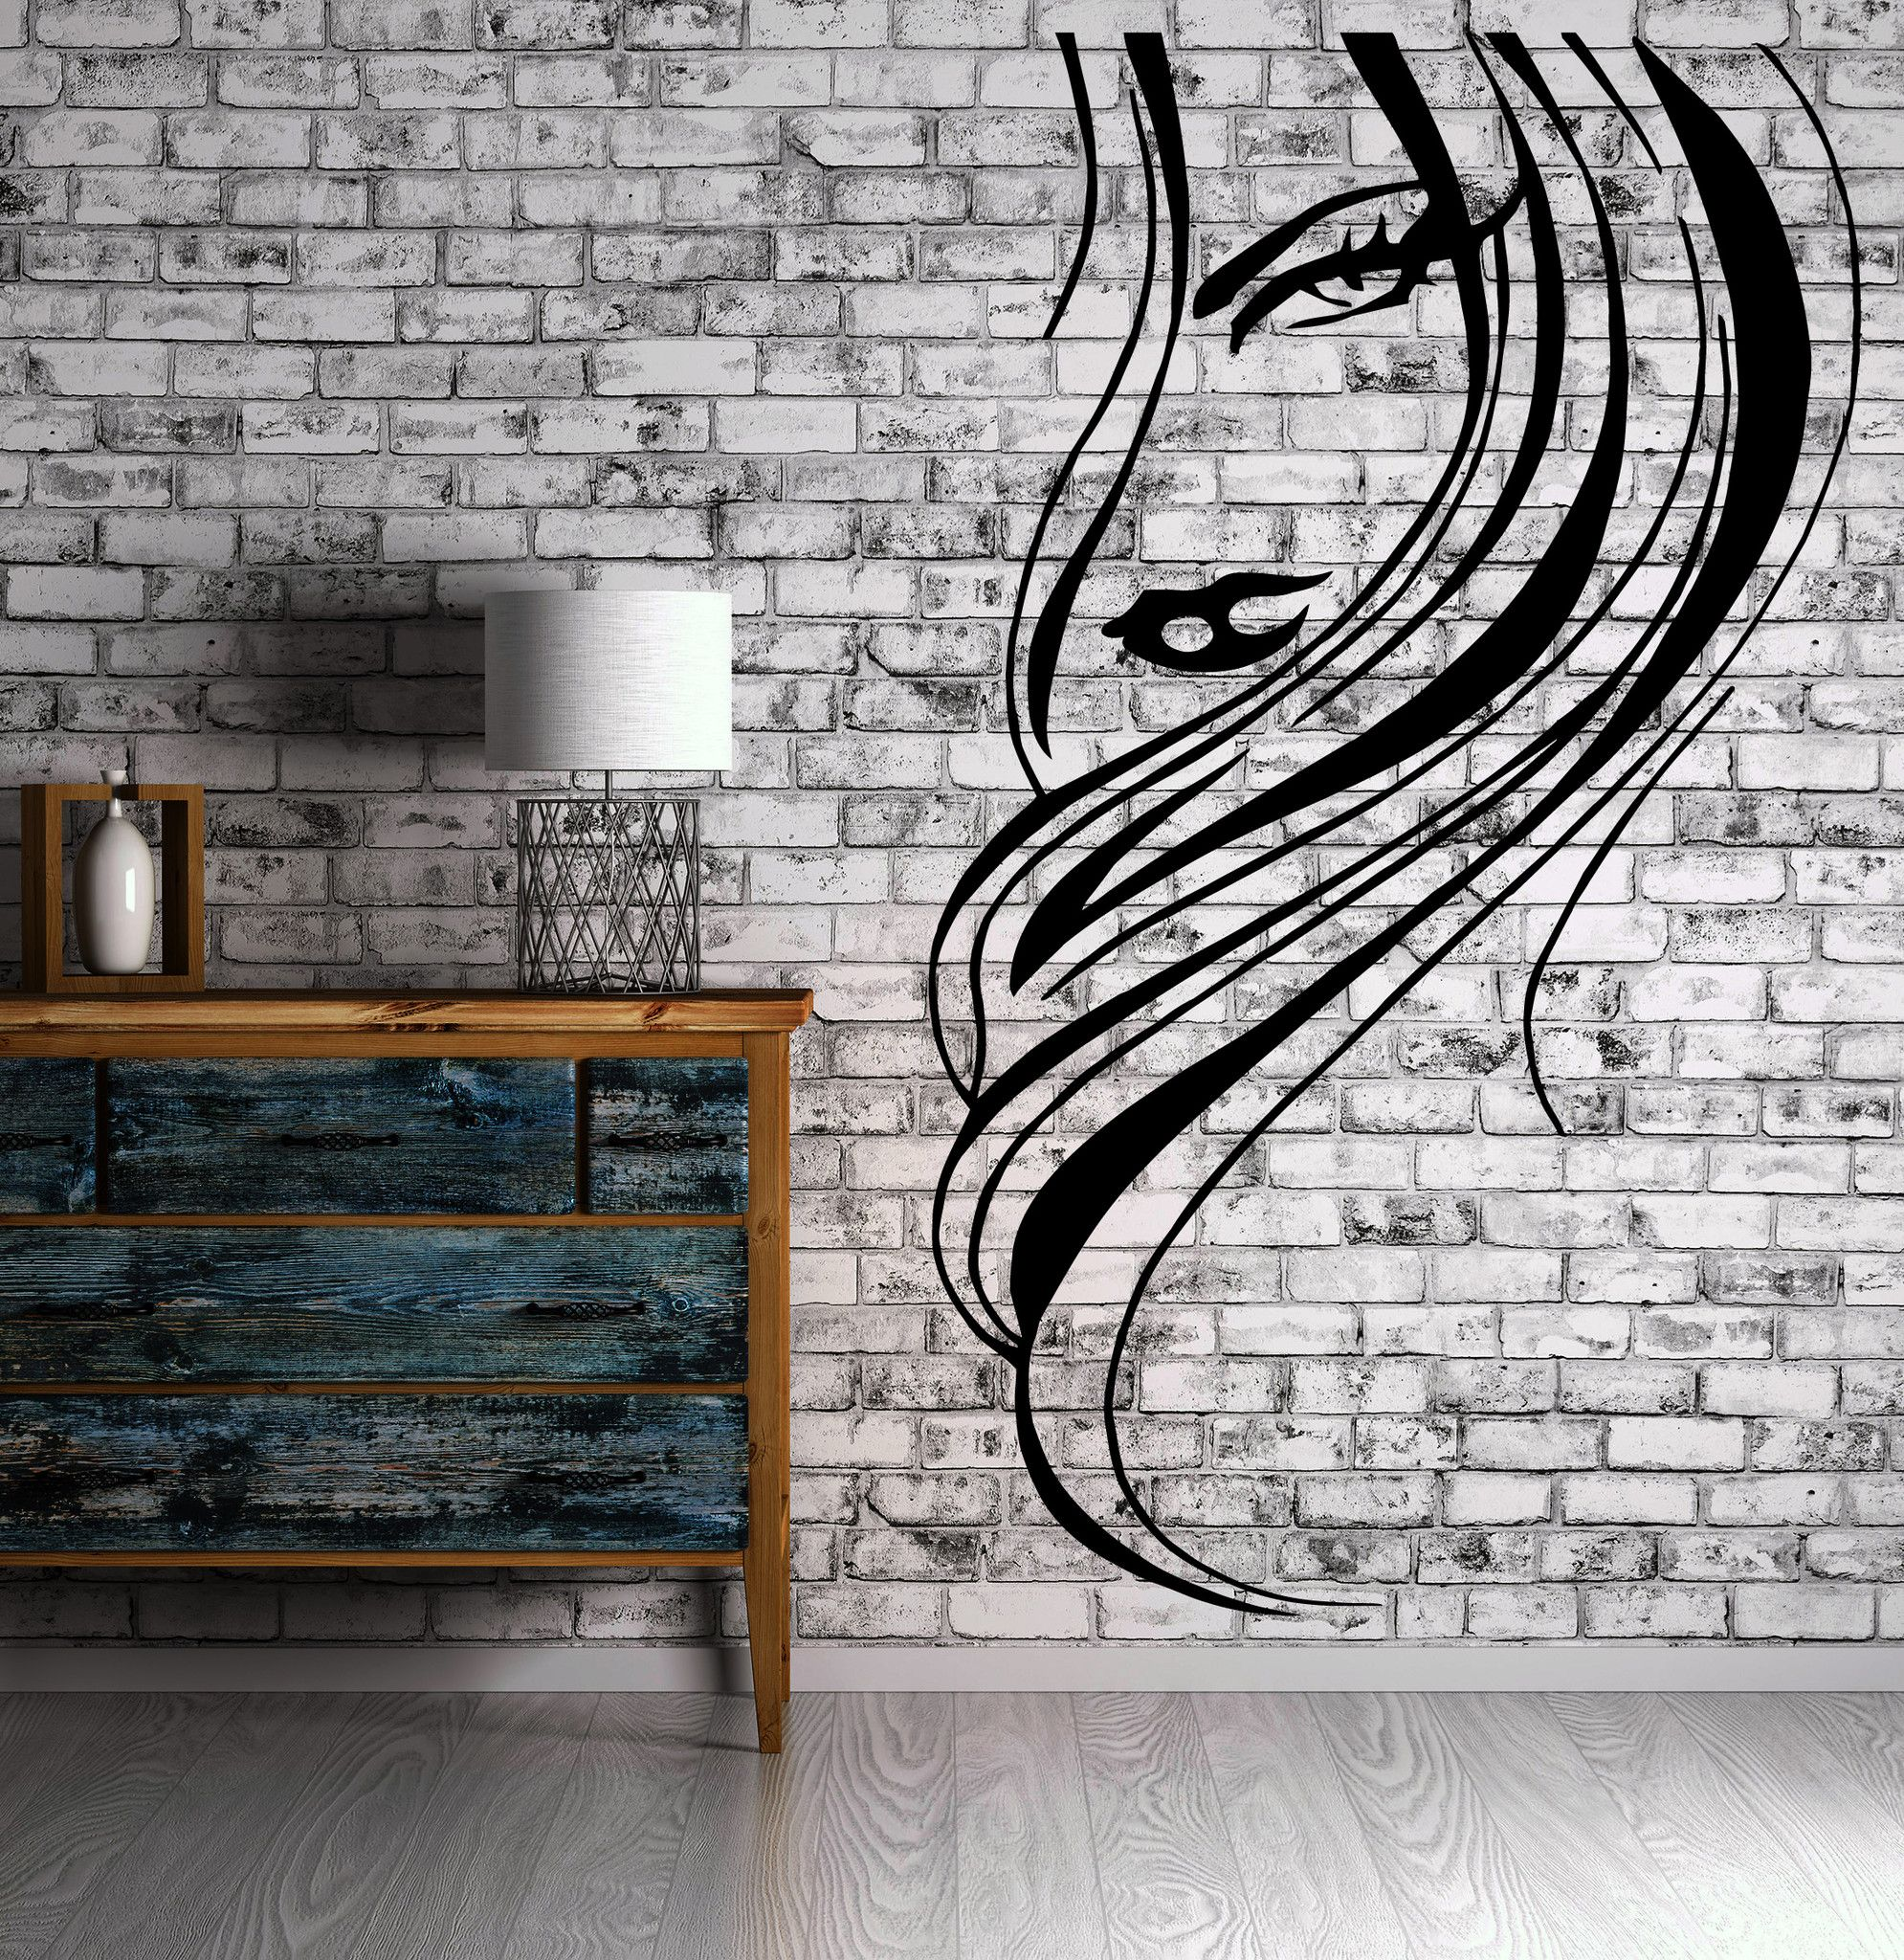 Design house hair - Beautiful Woman Face Sexy Lips Hair Decor Wall Mural Vinyl Decal Sticker M422